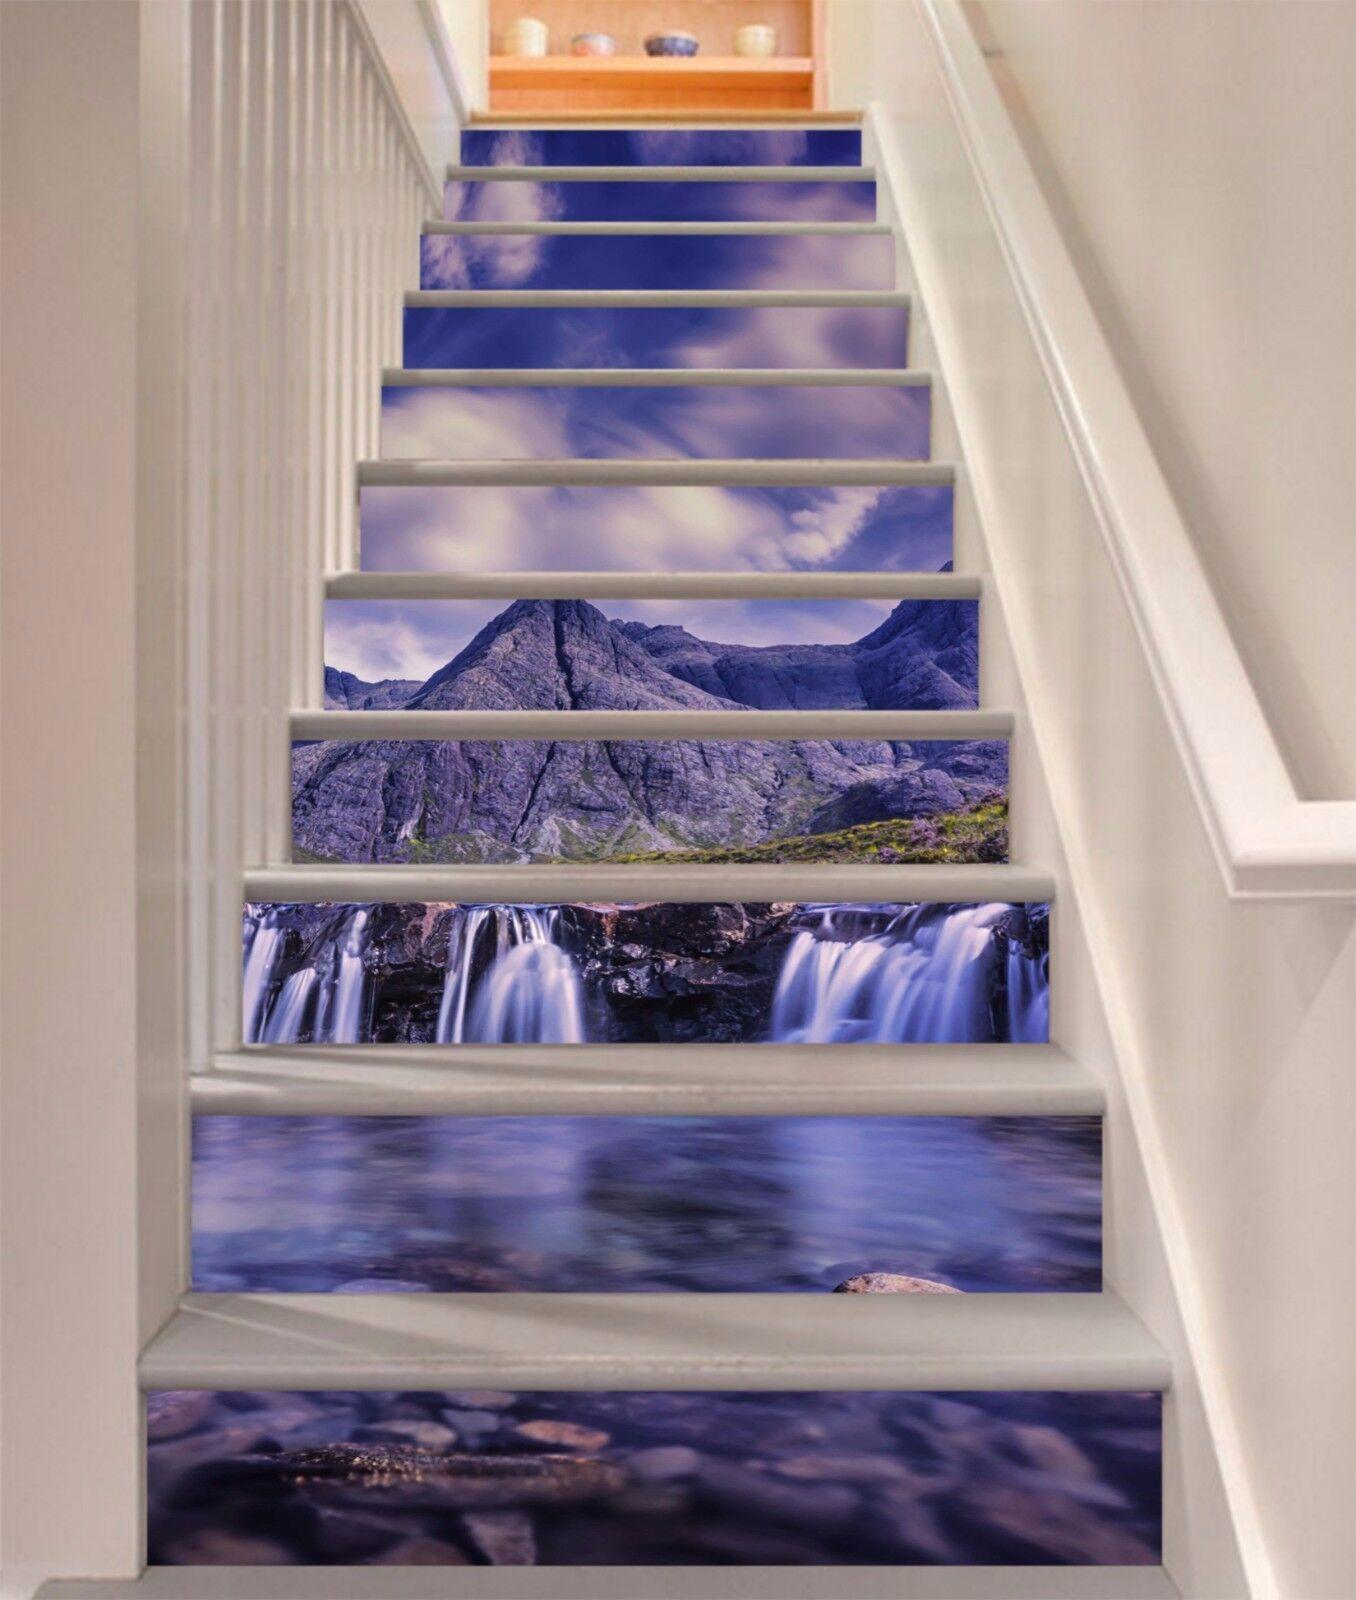 3D Sky falls Stair Risers Decoration Photo Mural Vinyl Decal WandPapier AU